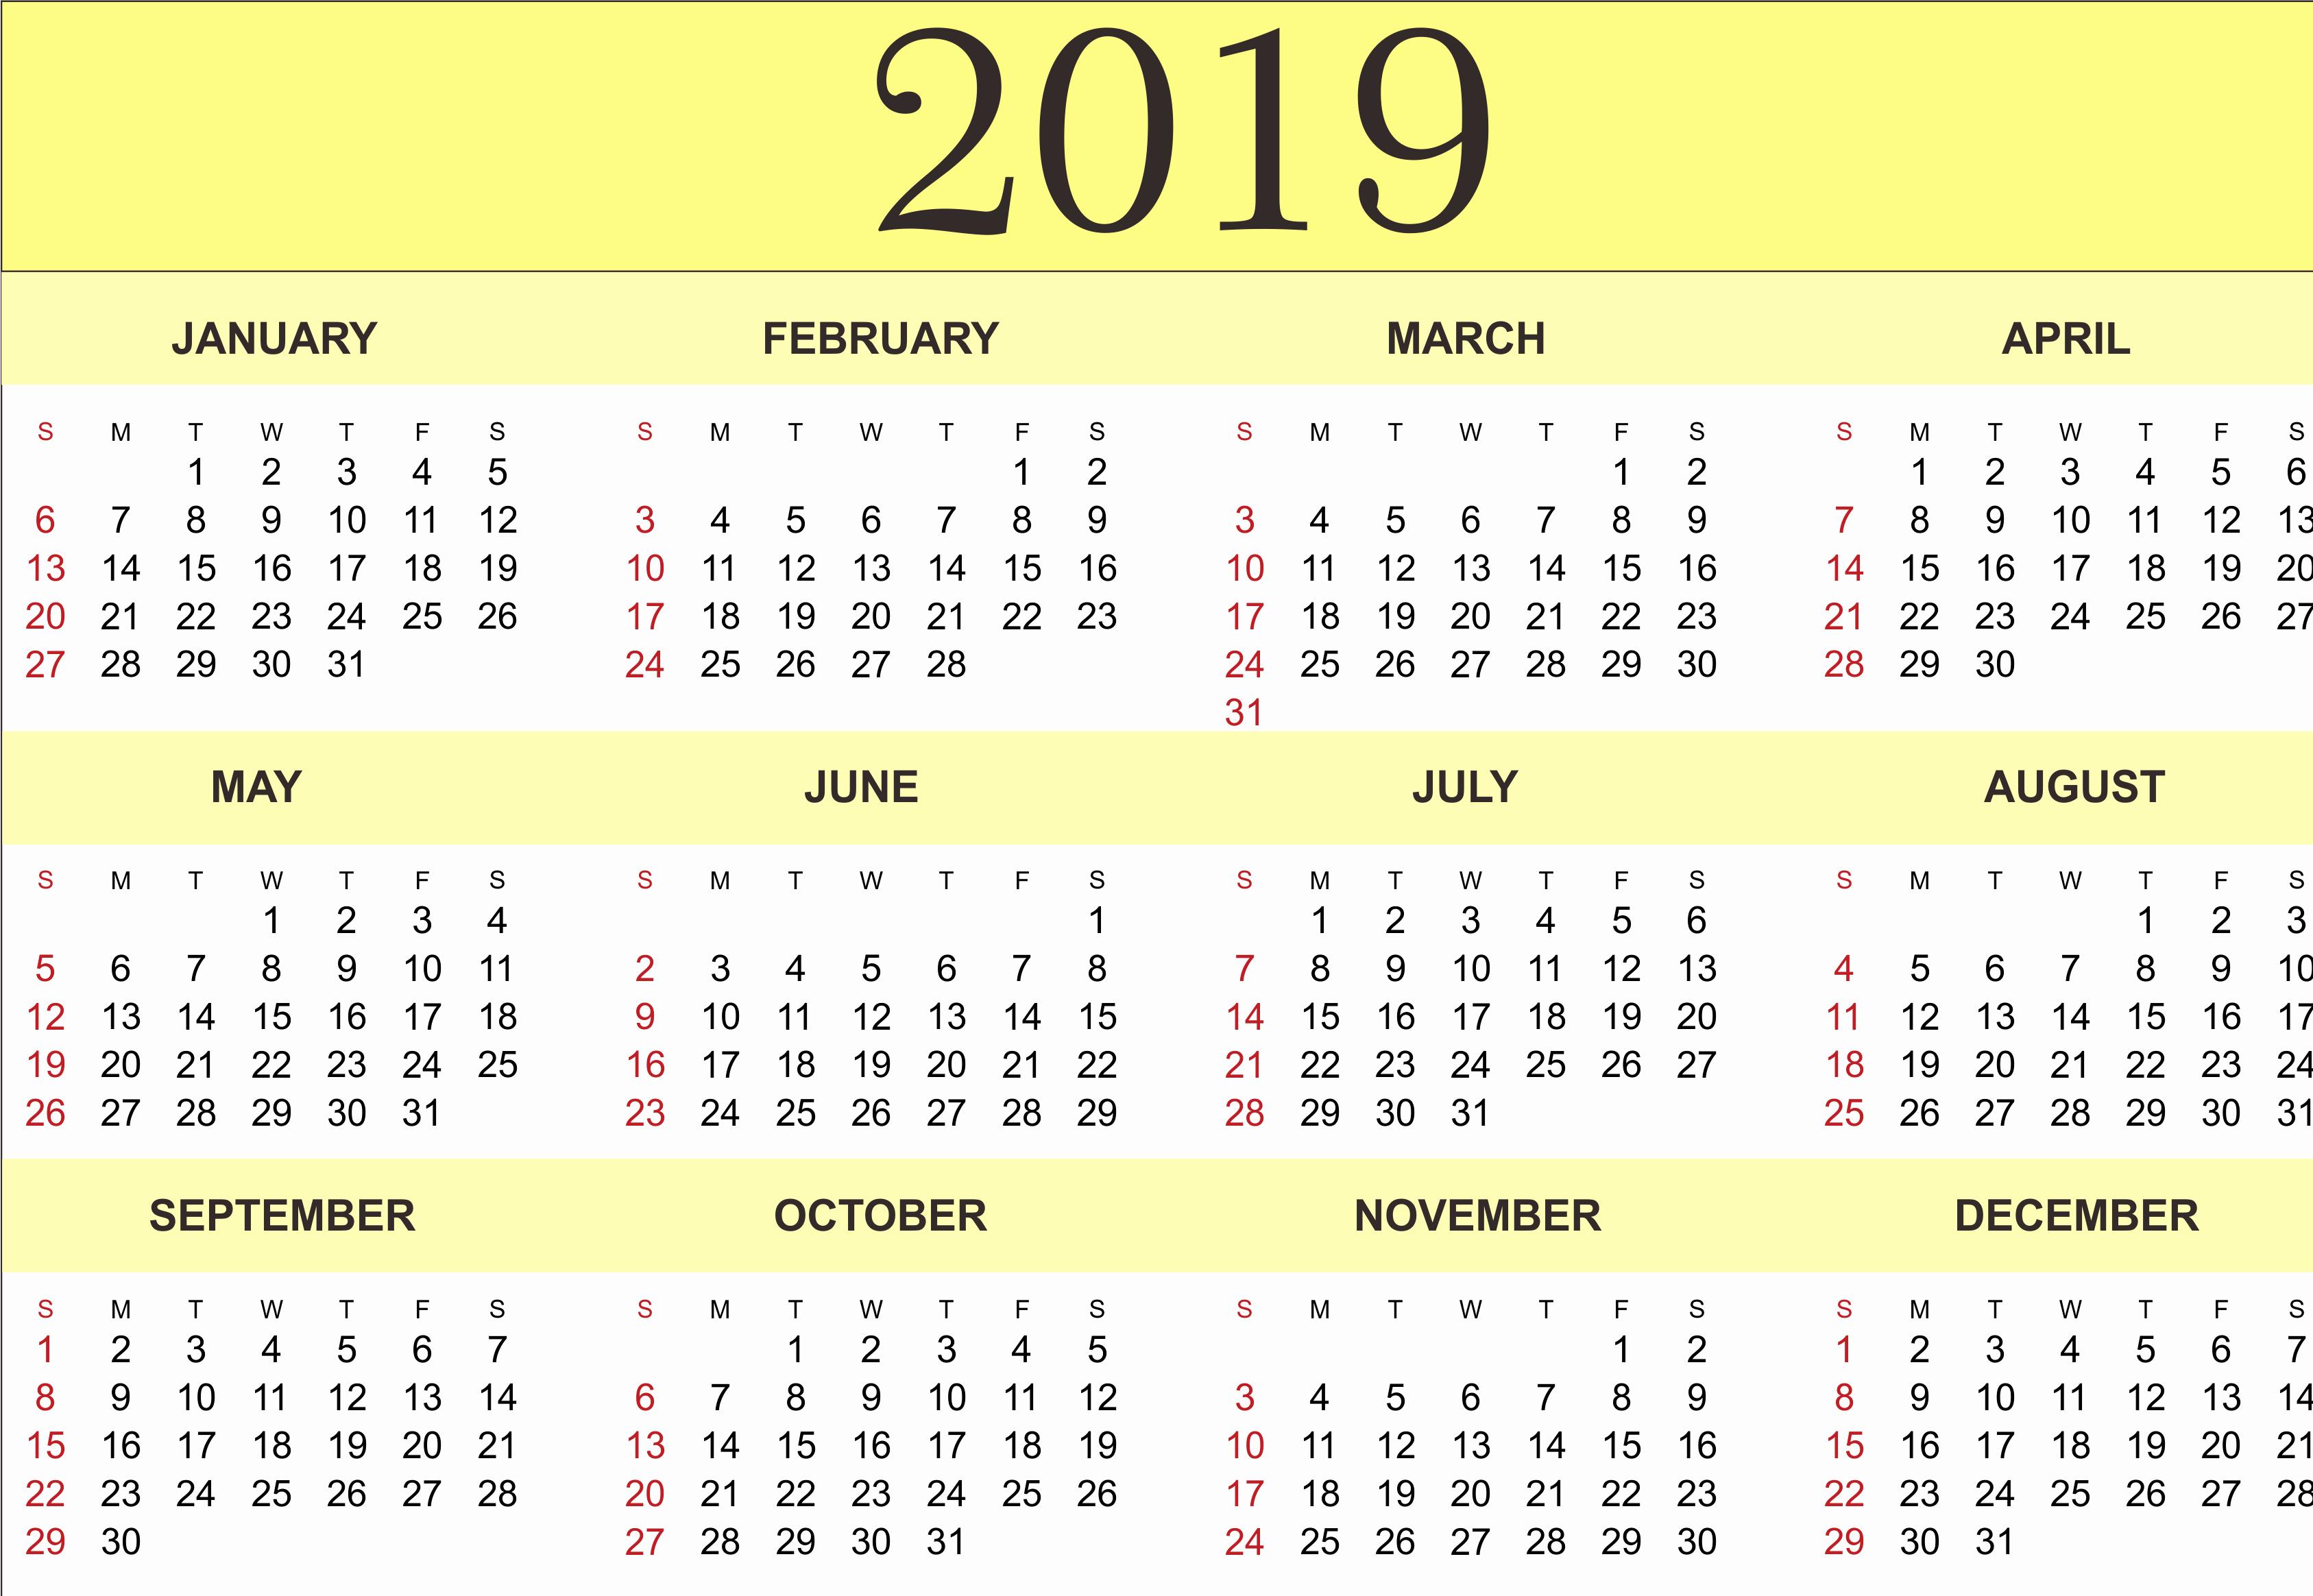 Free Printable Calendar Templates 2019 New Free Yearly Calendar 2019 Printable Blank Templates